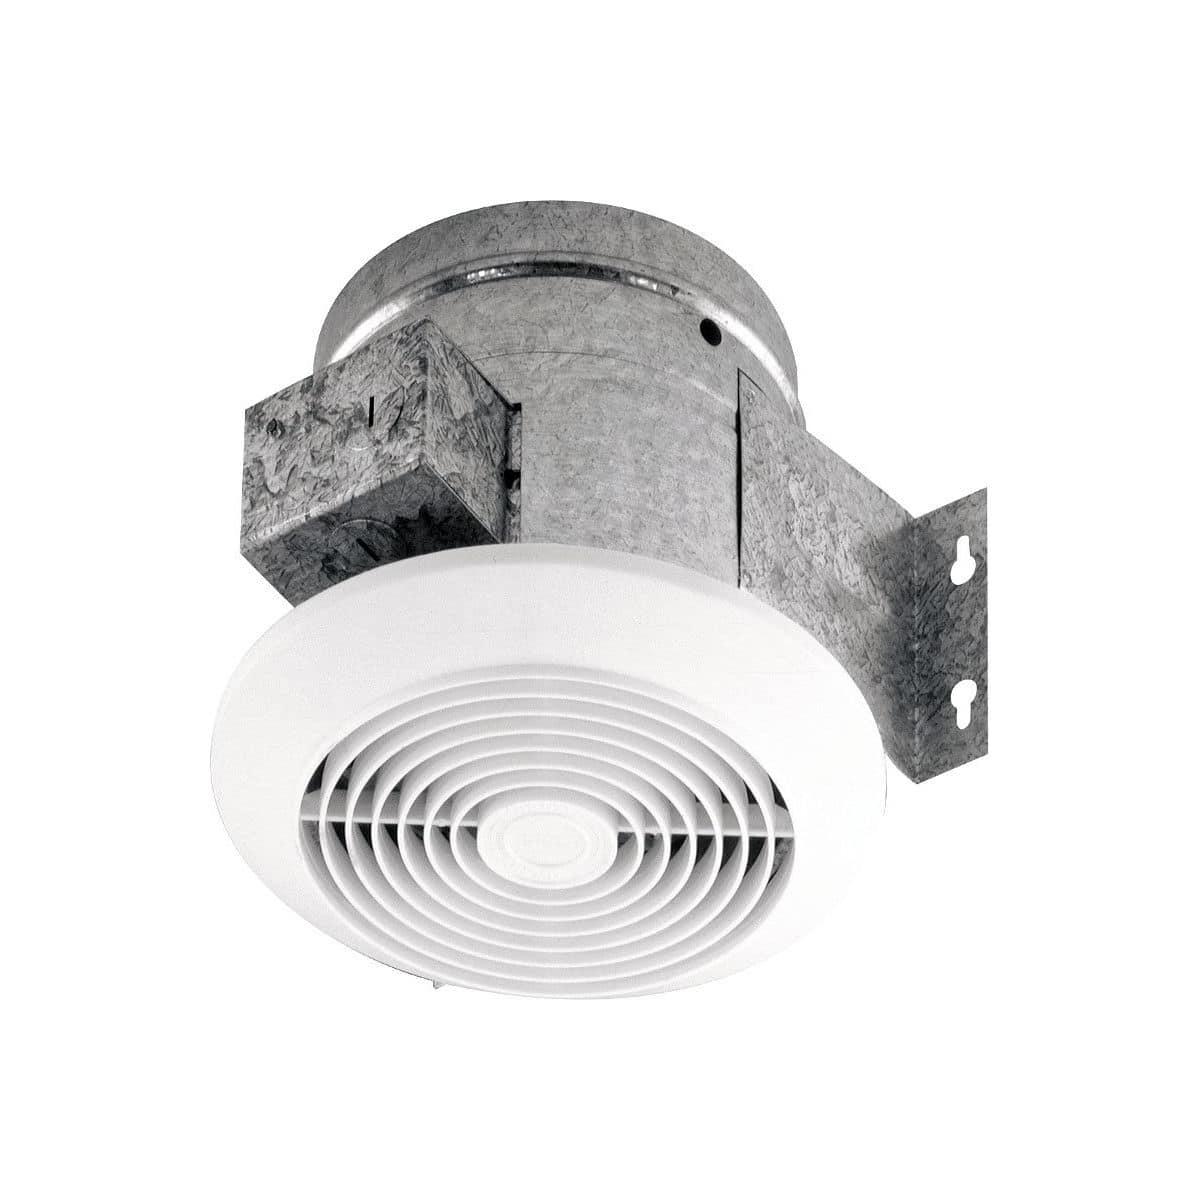 hight resolution of broan 6 60 cfm ceiling ventilation fan white plastic grille 673